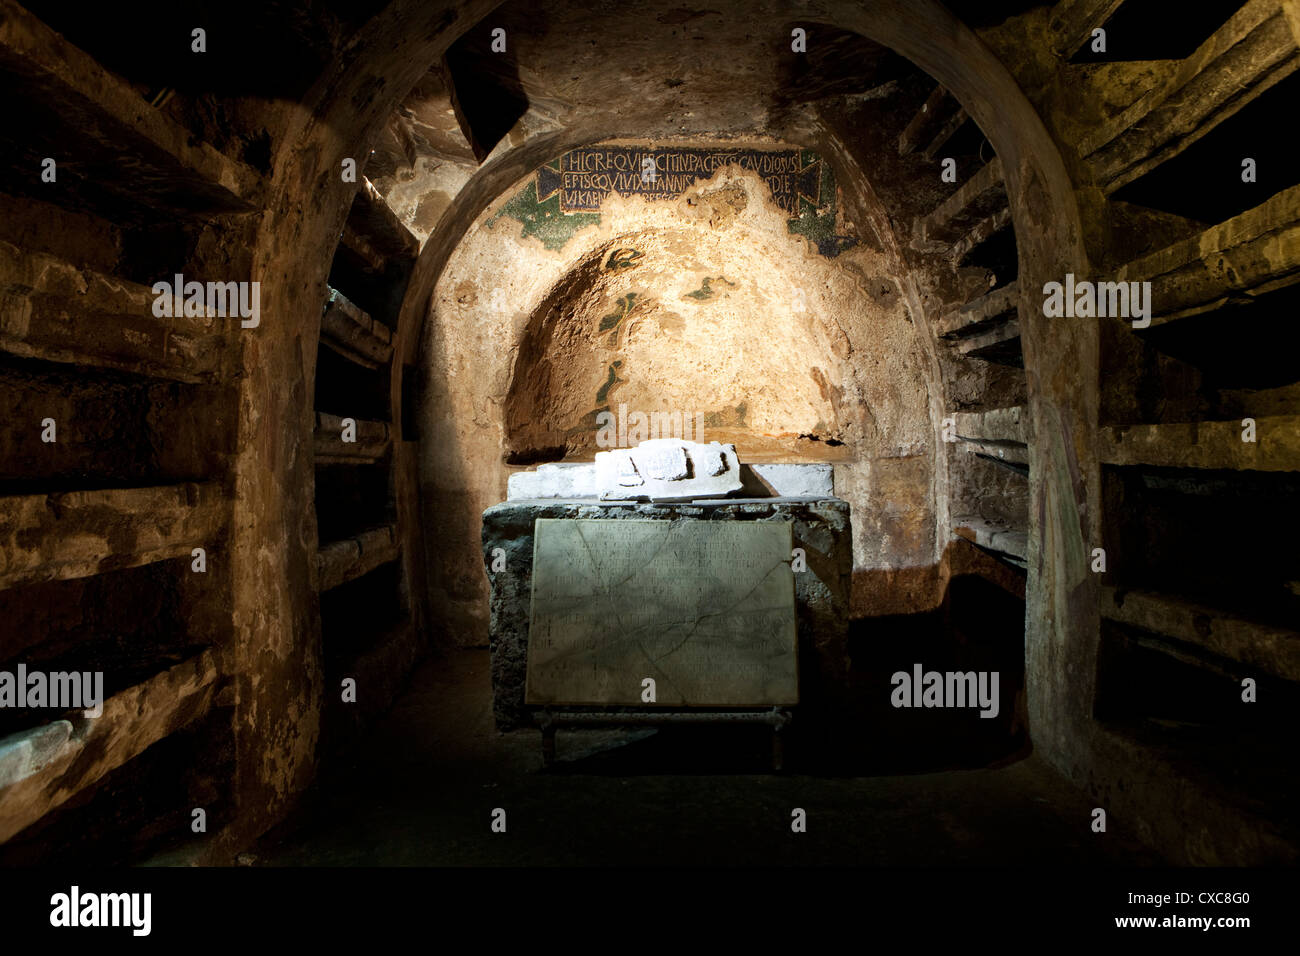 The underground catacombs of San Gaudioso (St. Gaudiosus), Naples, Campania, Italy, Europe - Stock Image